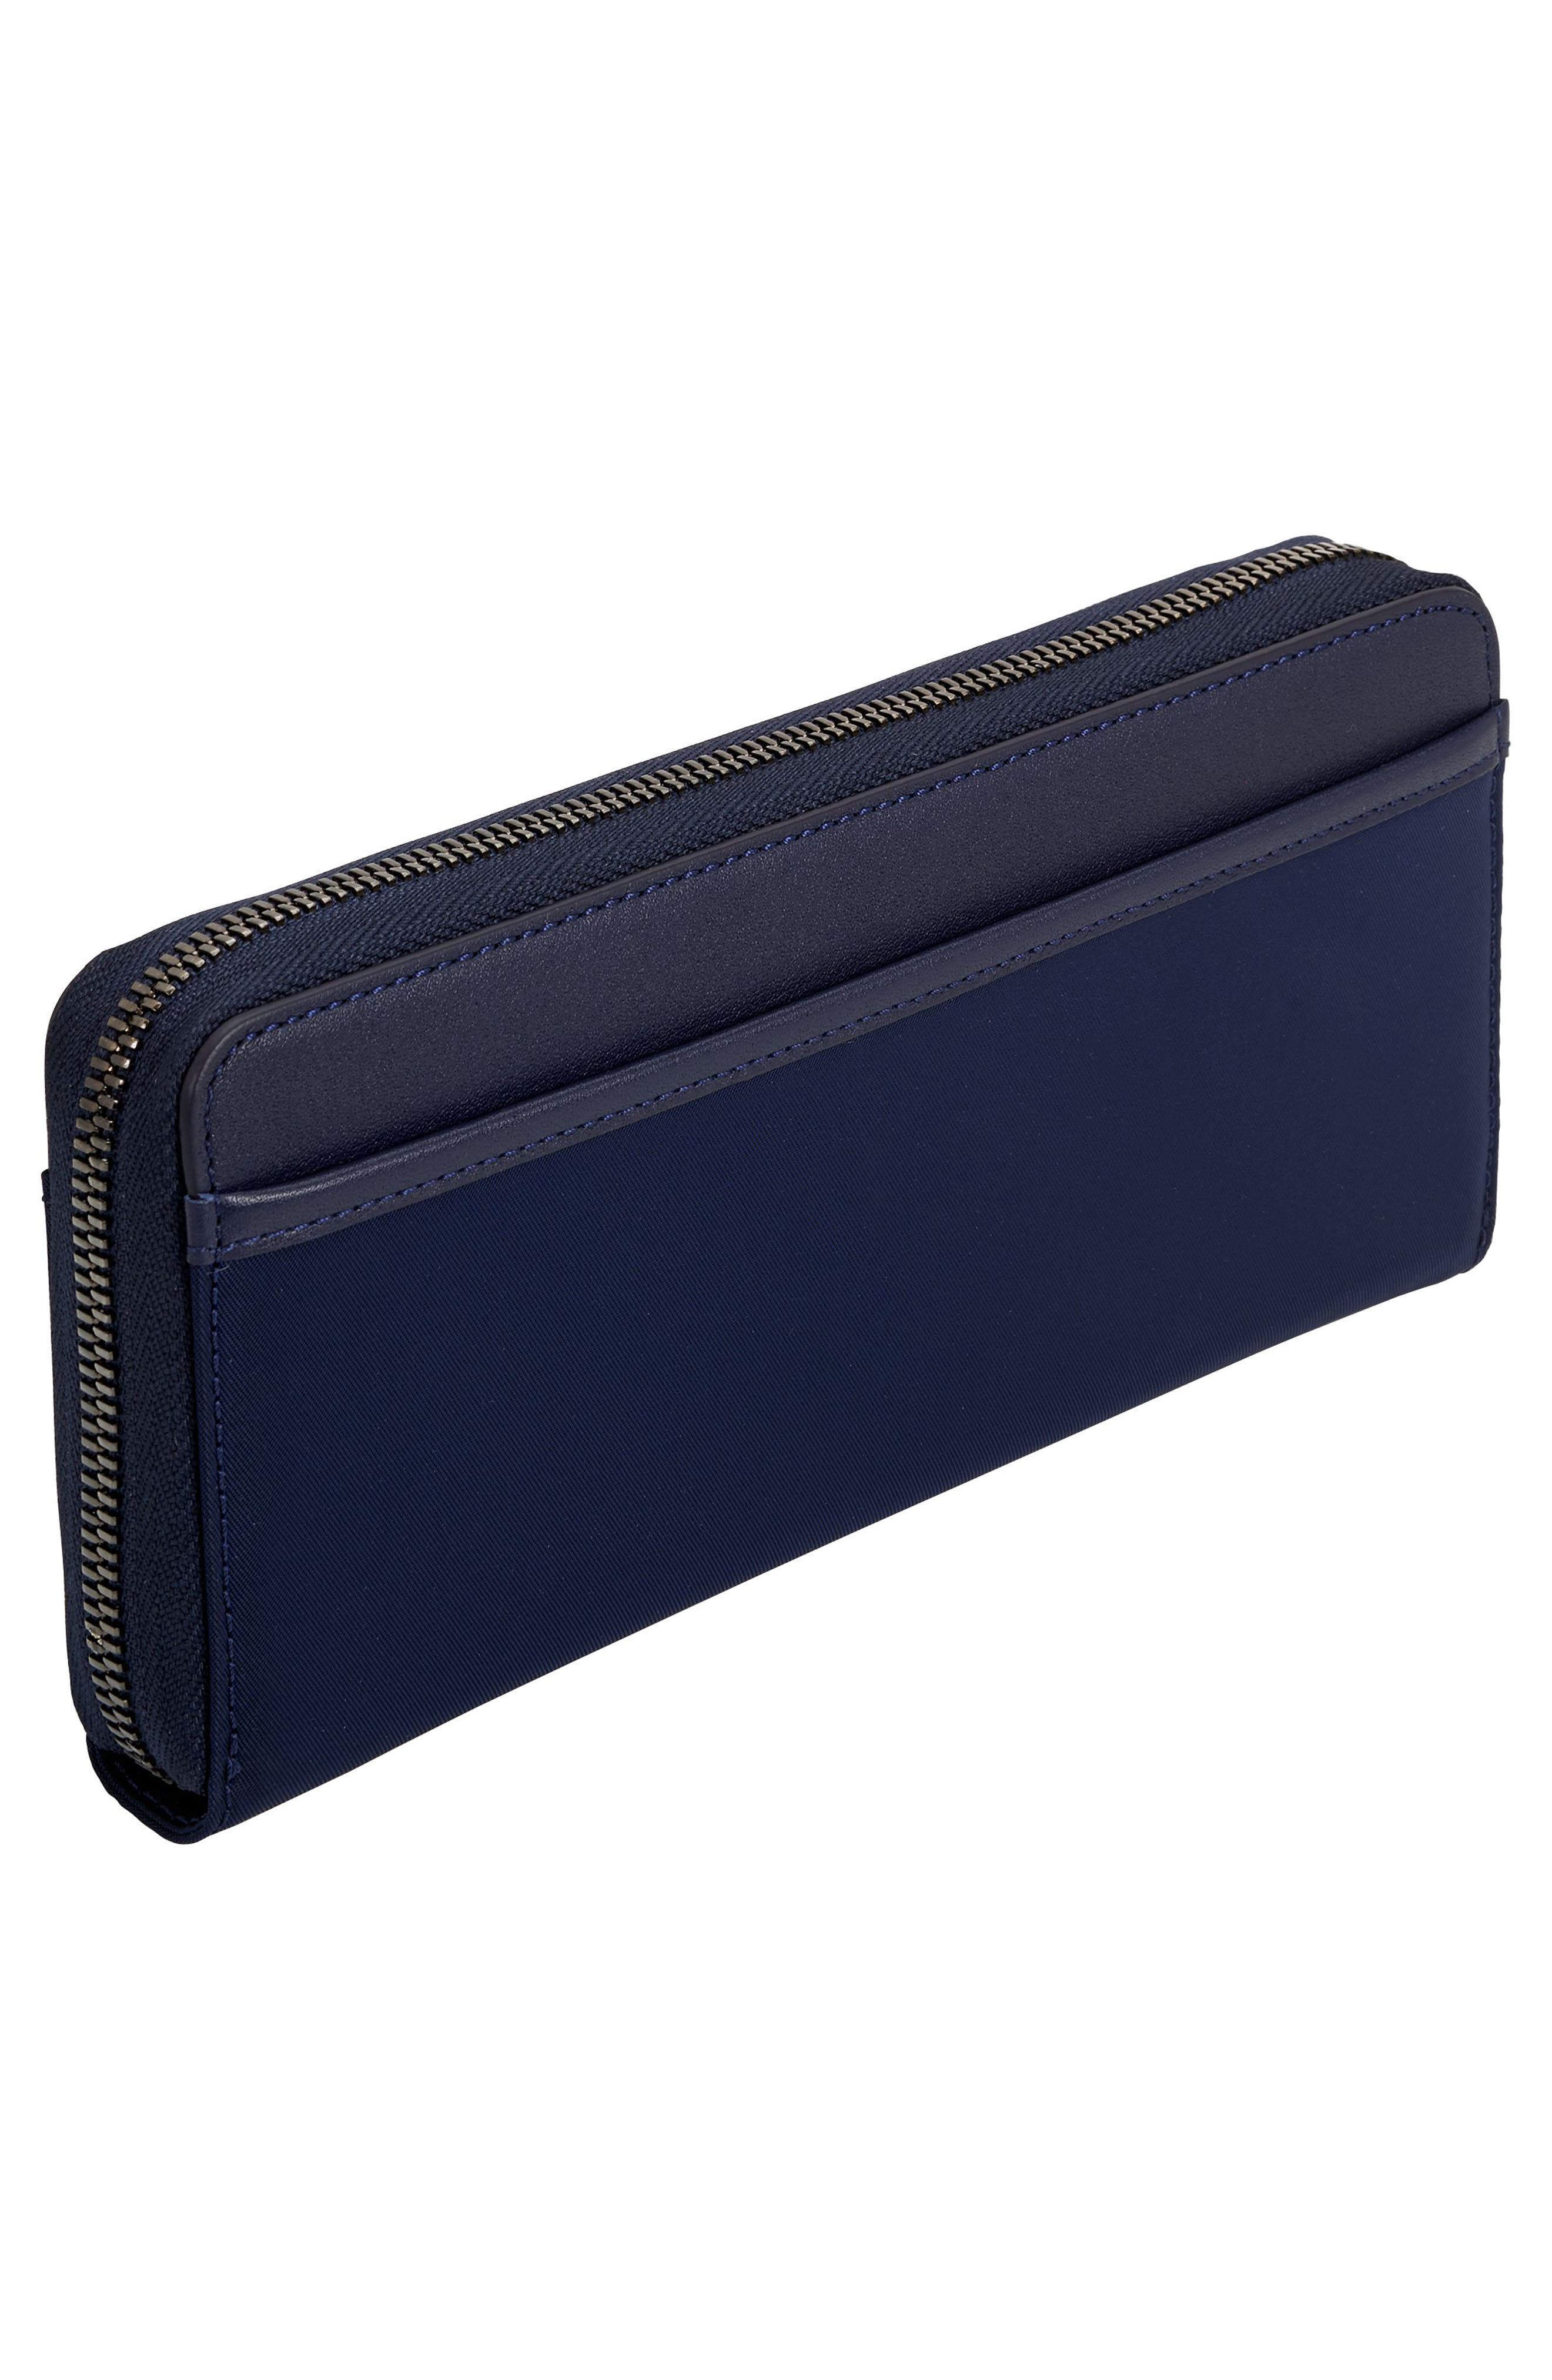 Continental Zip Tech Wallet,                             Alternate thumbnail 13, color,